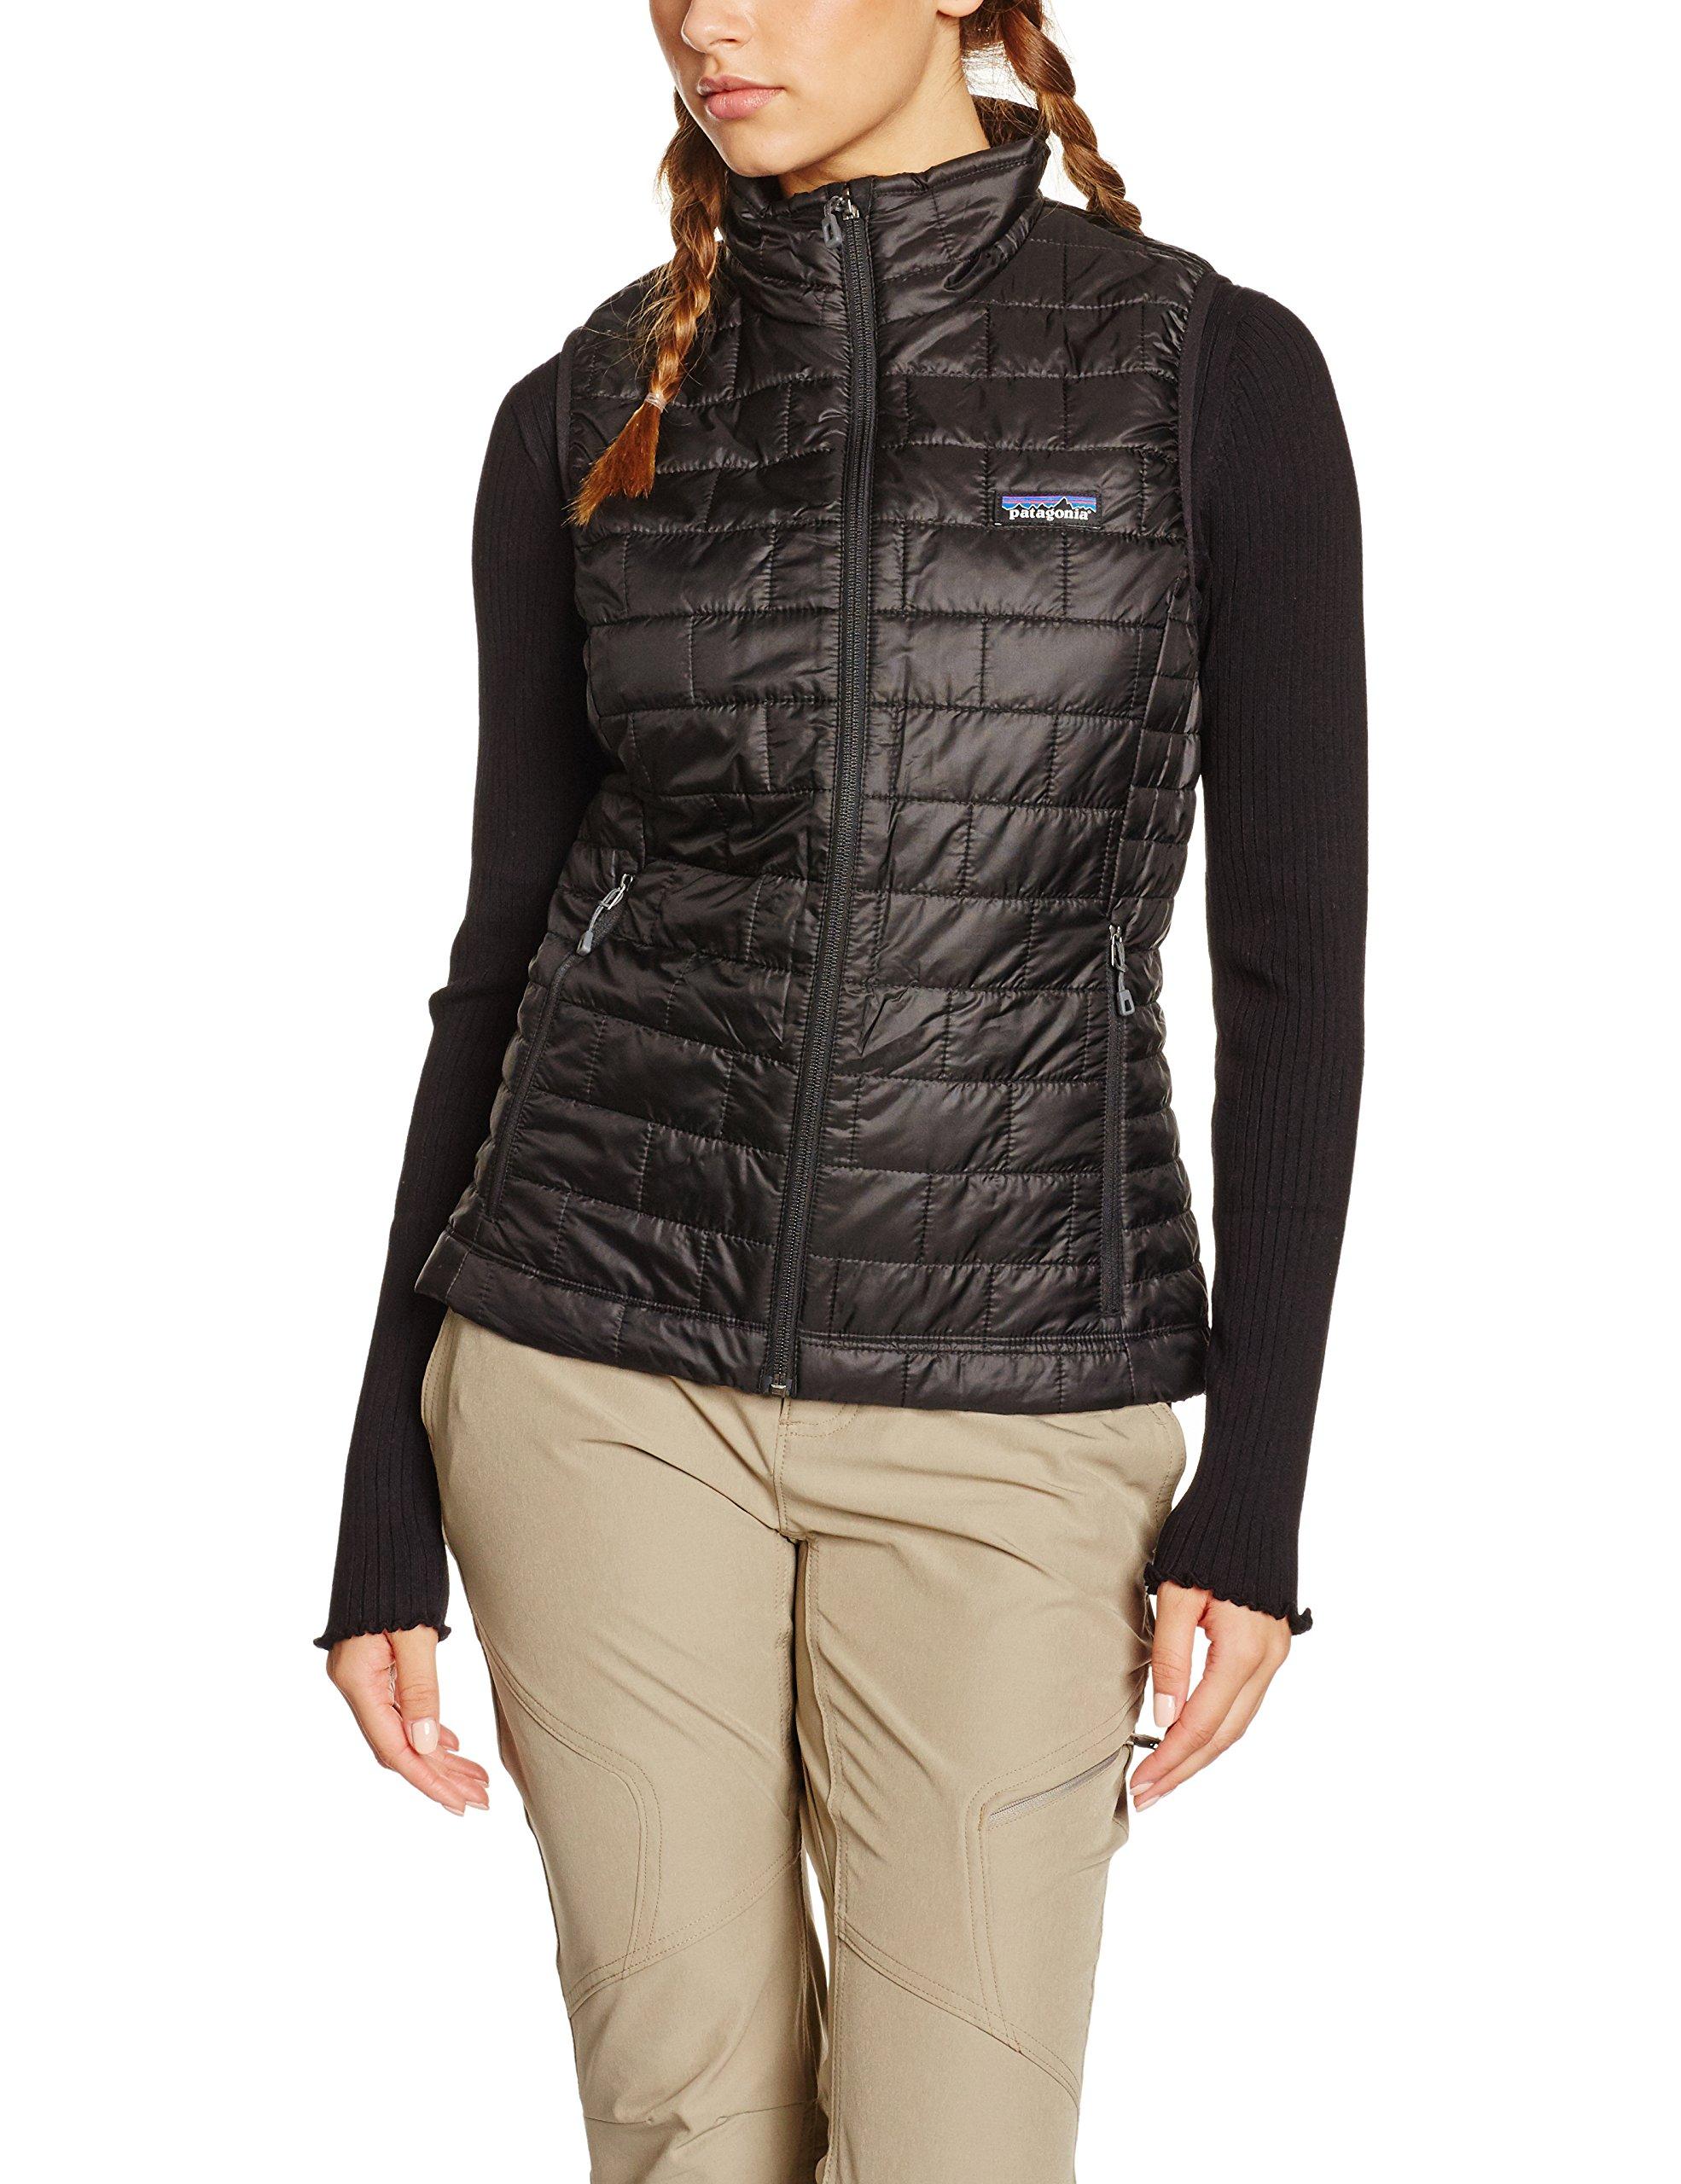 Patagonia Womens Nano Puff Vest - Black (BLK) (M)